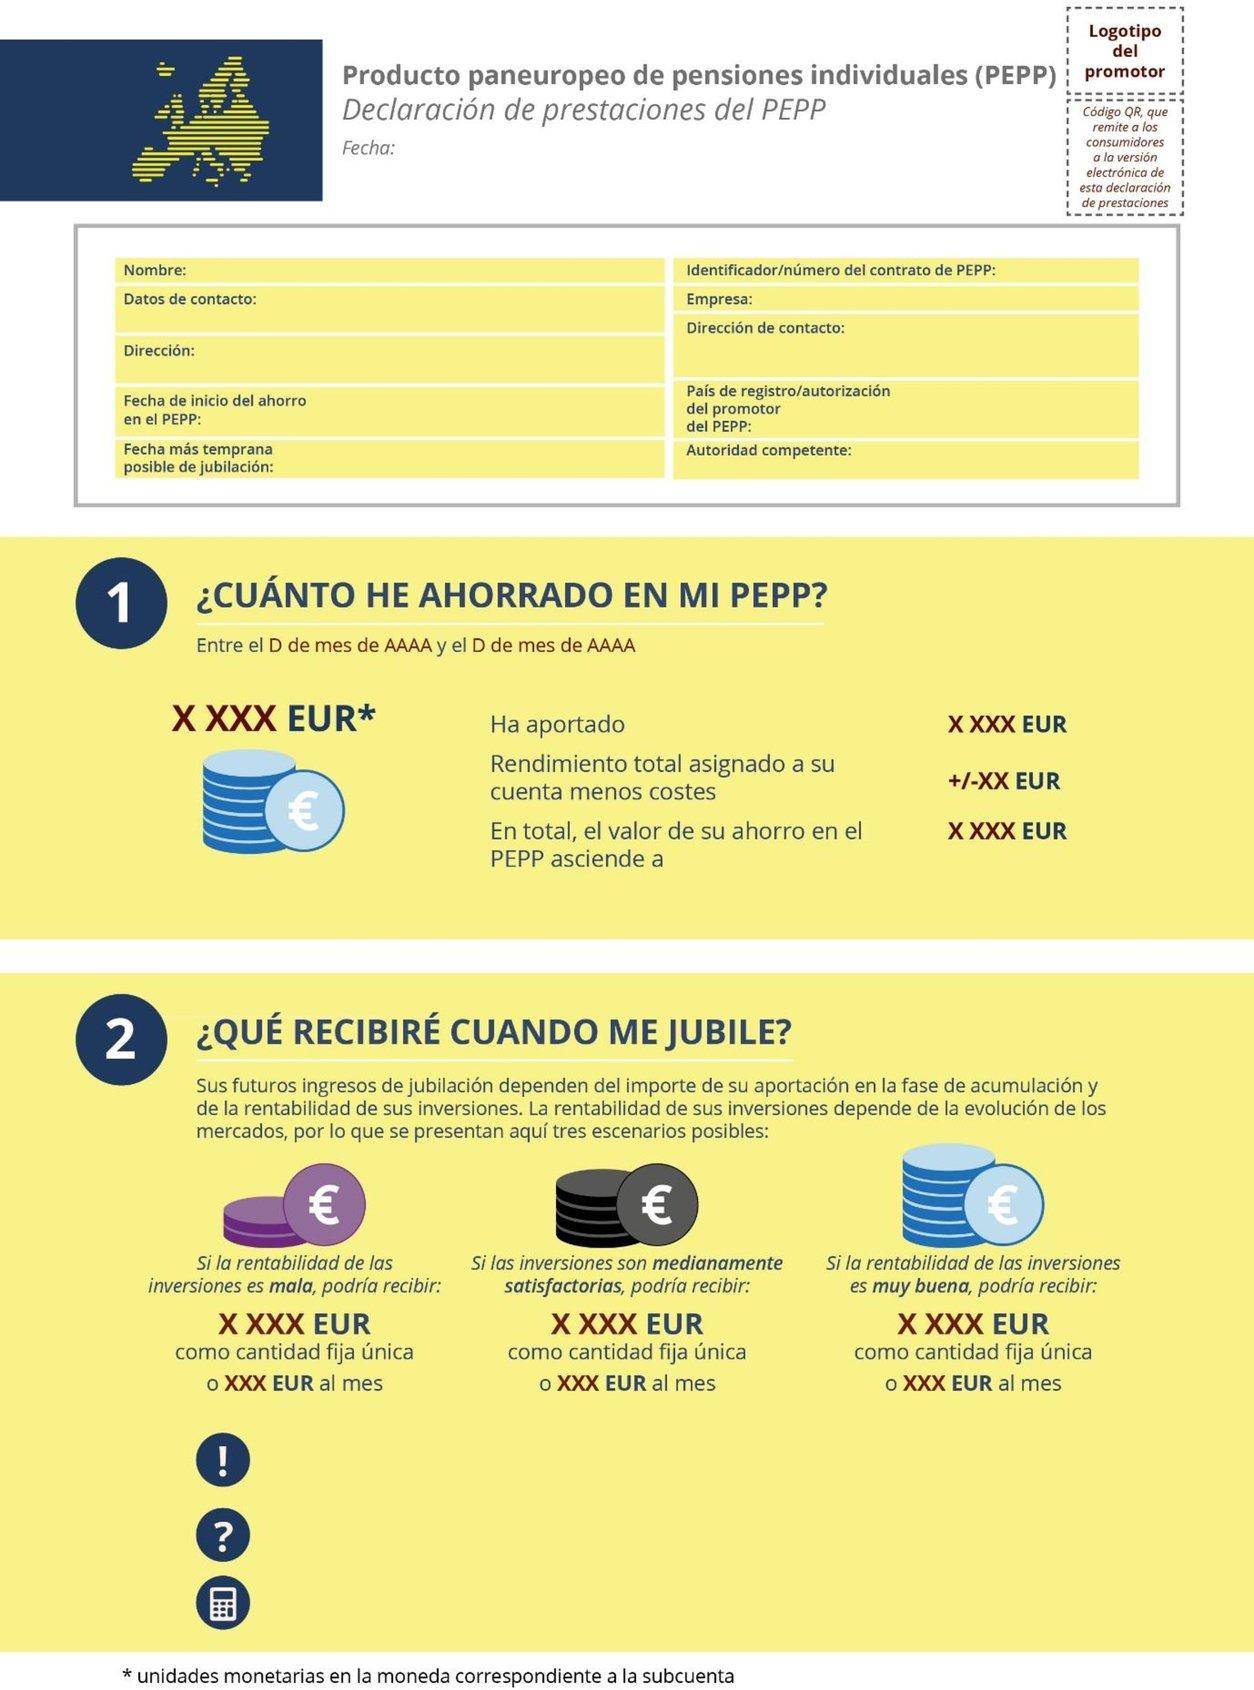 Imagen: http://publications.europa.eu/resource/uriserv/OJ.L_.2021.099.01.0001.01.SPA.xhtml.L_2021099ES.01002401.tif.jpg